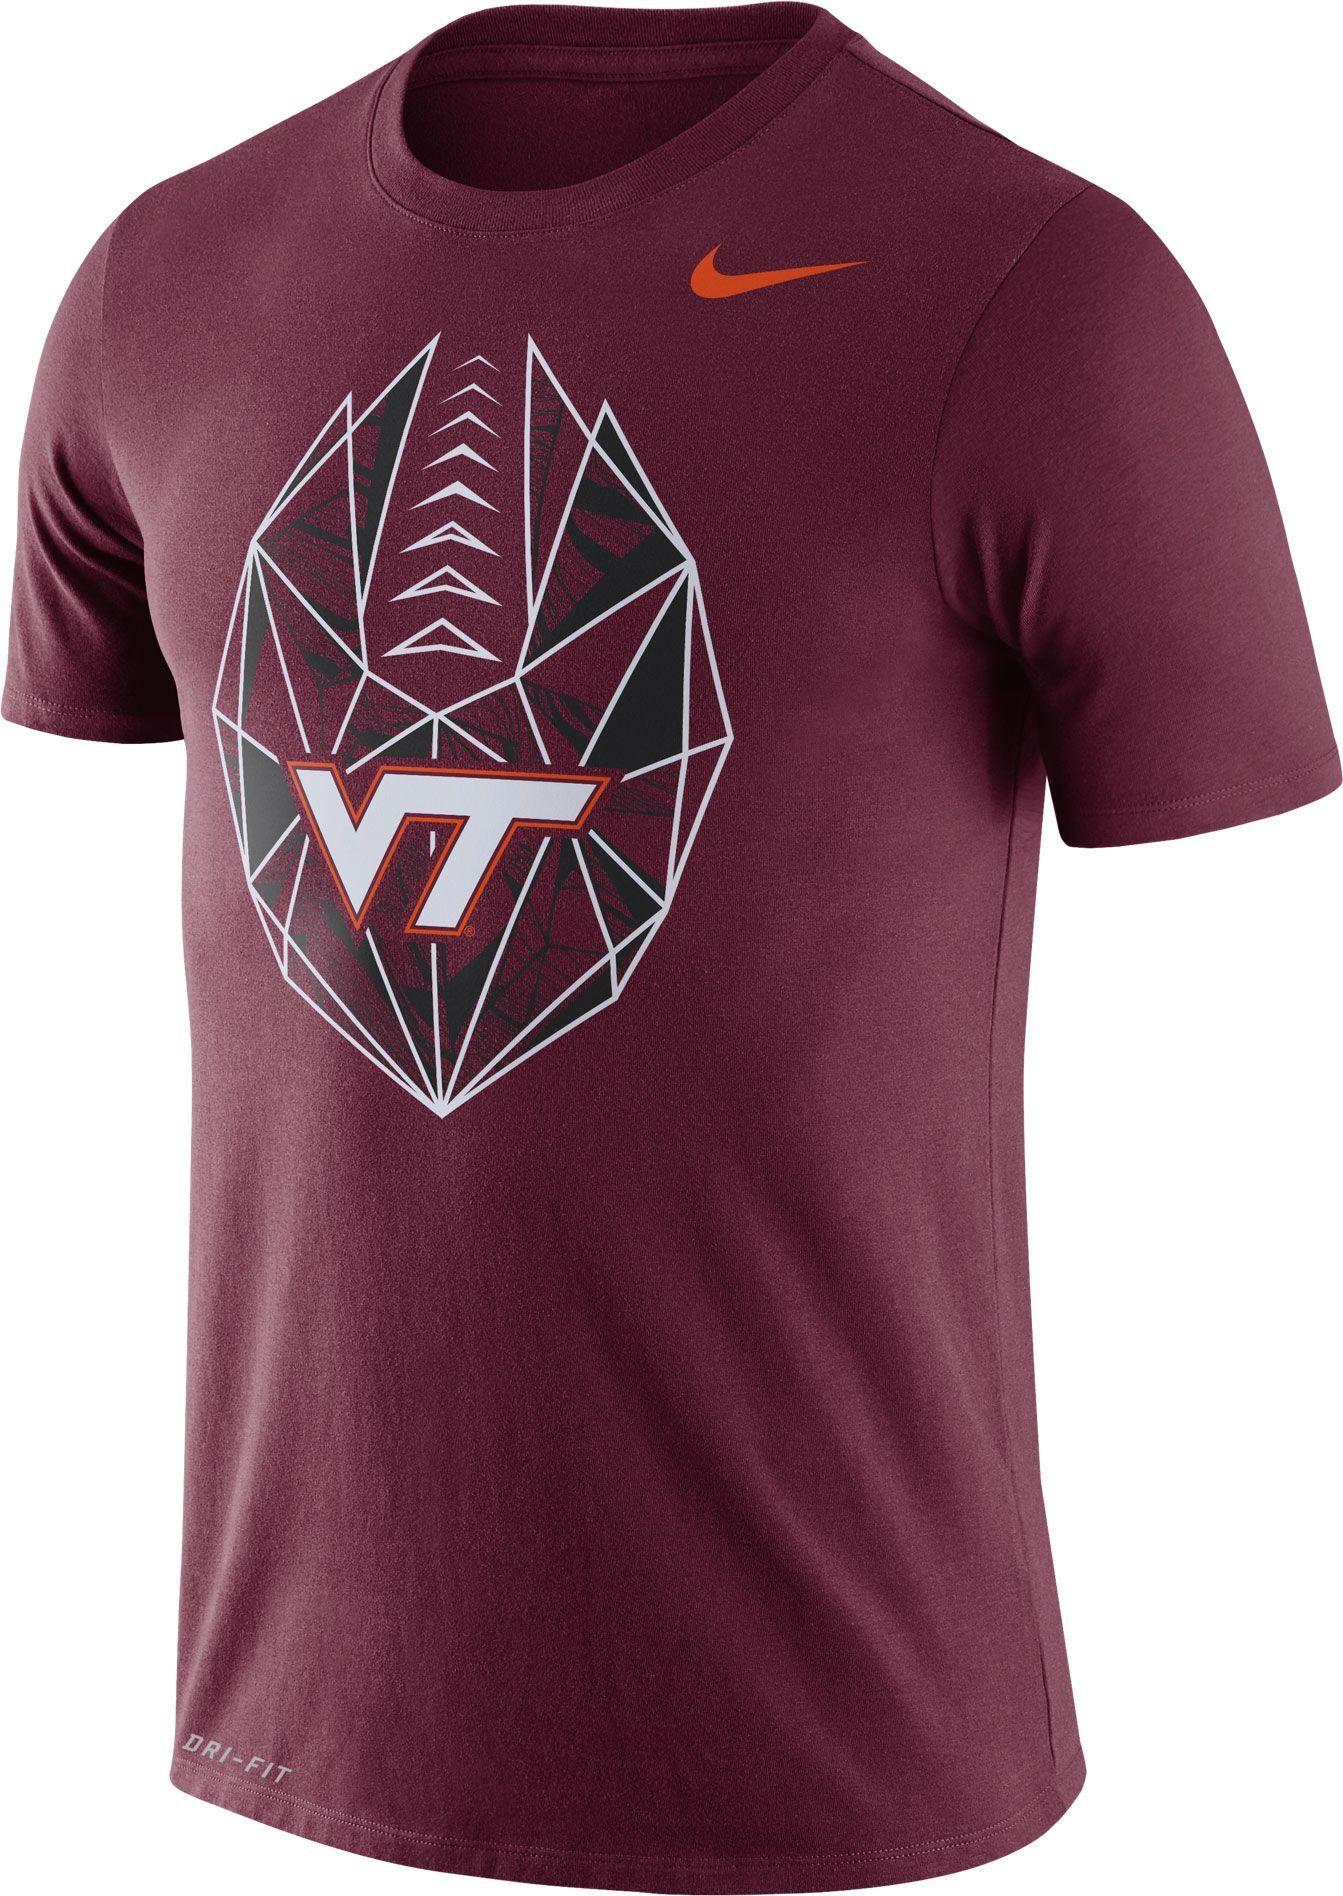 best service 15273 70e5f Nike Men's Virginia Tech Hokies Maroon Dri-FIT Football Icon ...